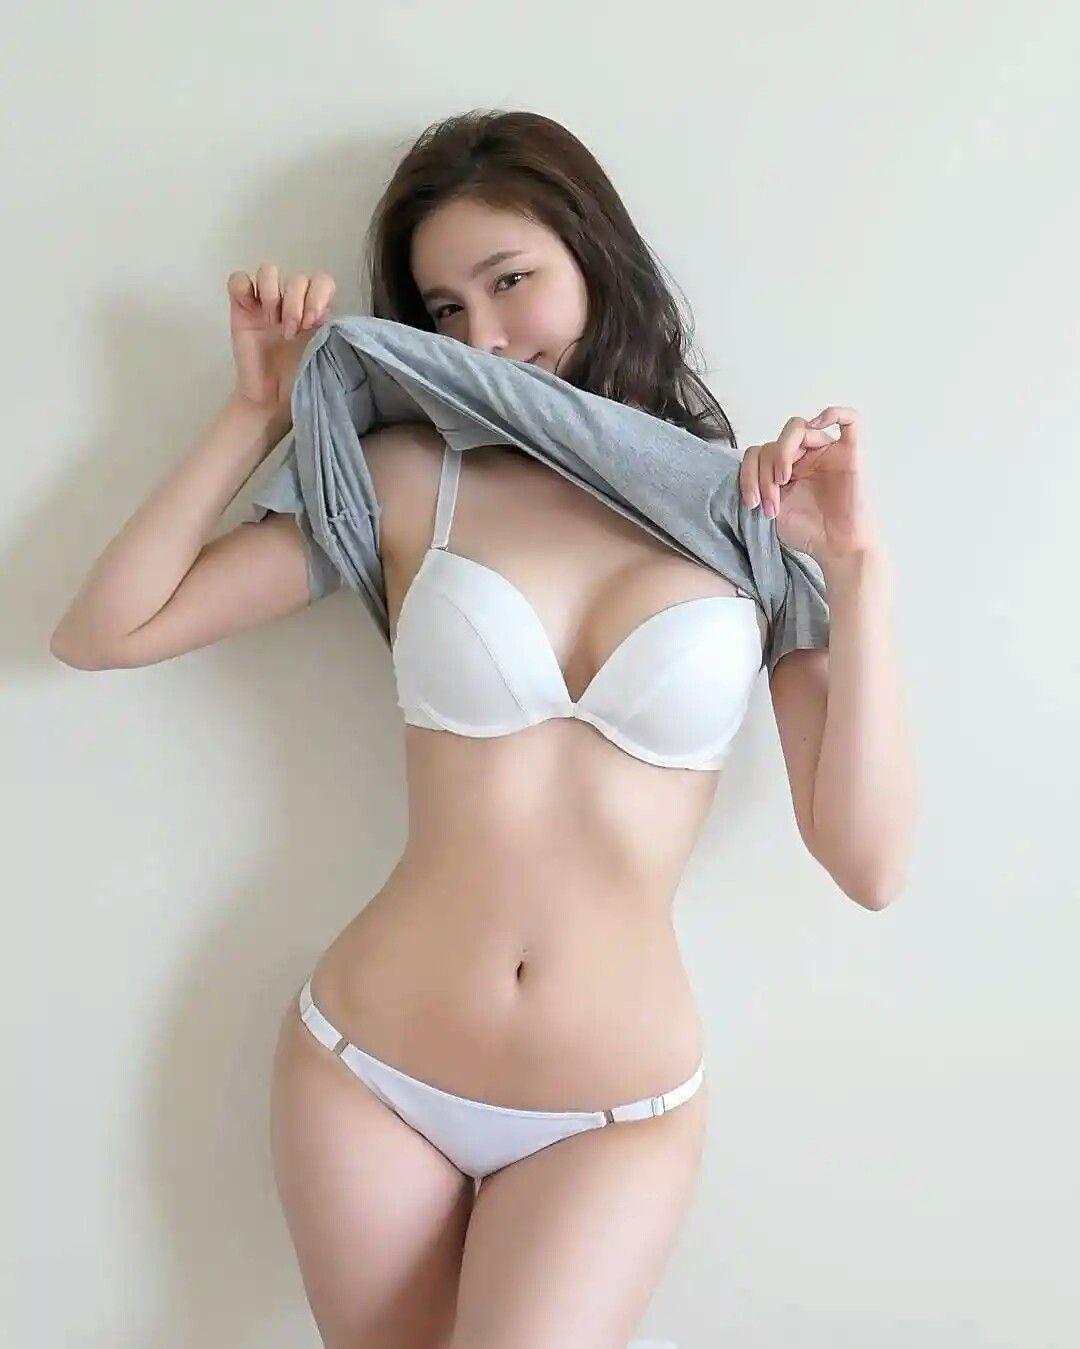 Asian girls in bra